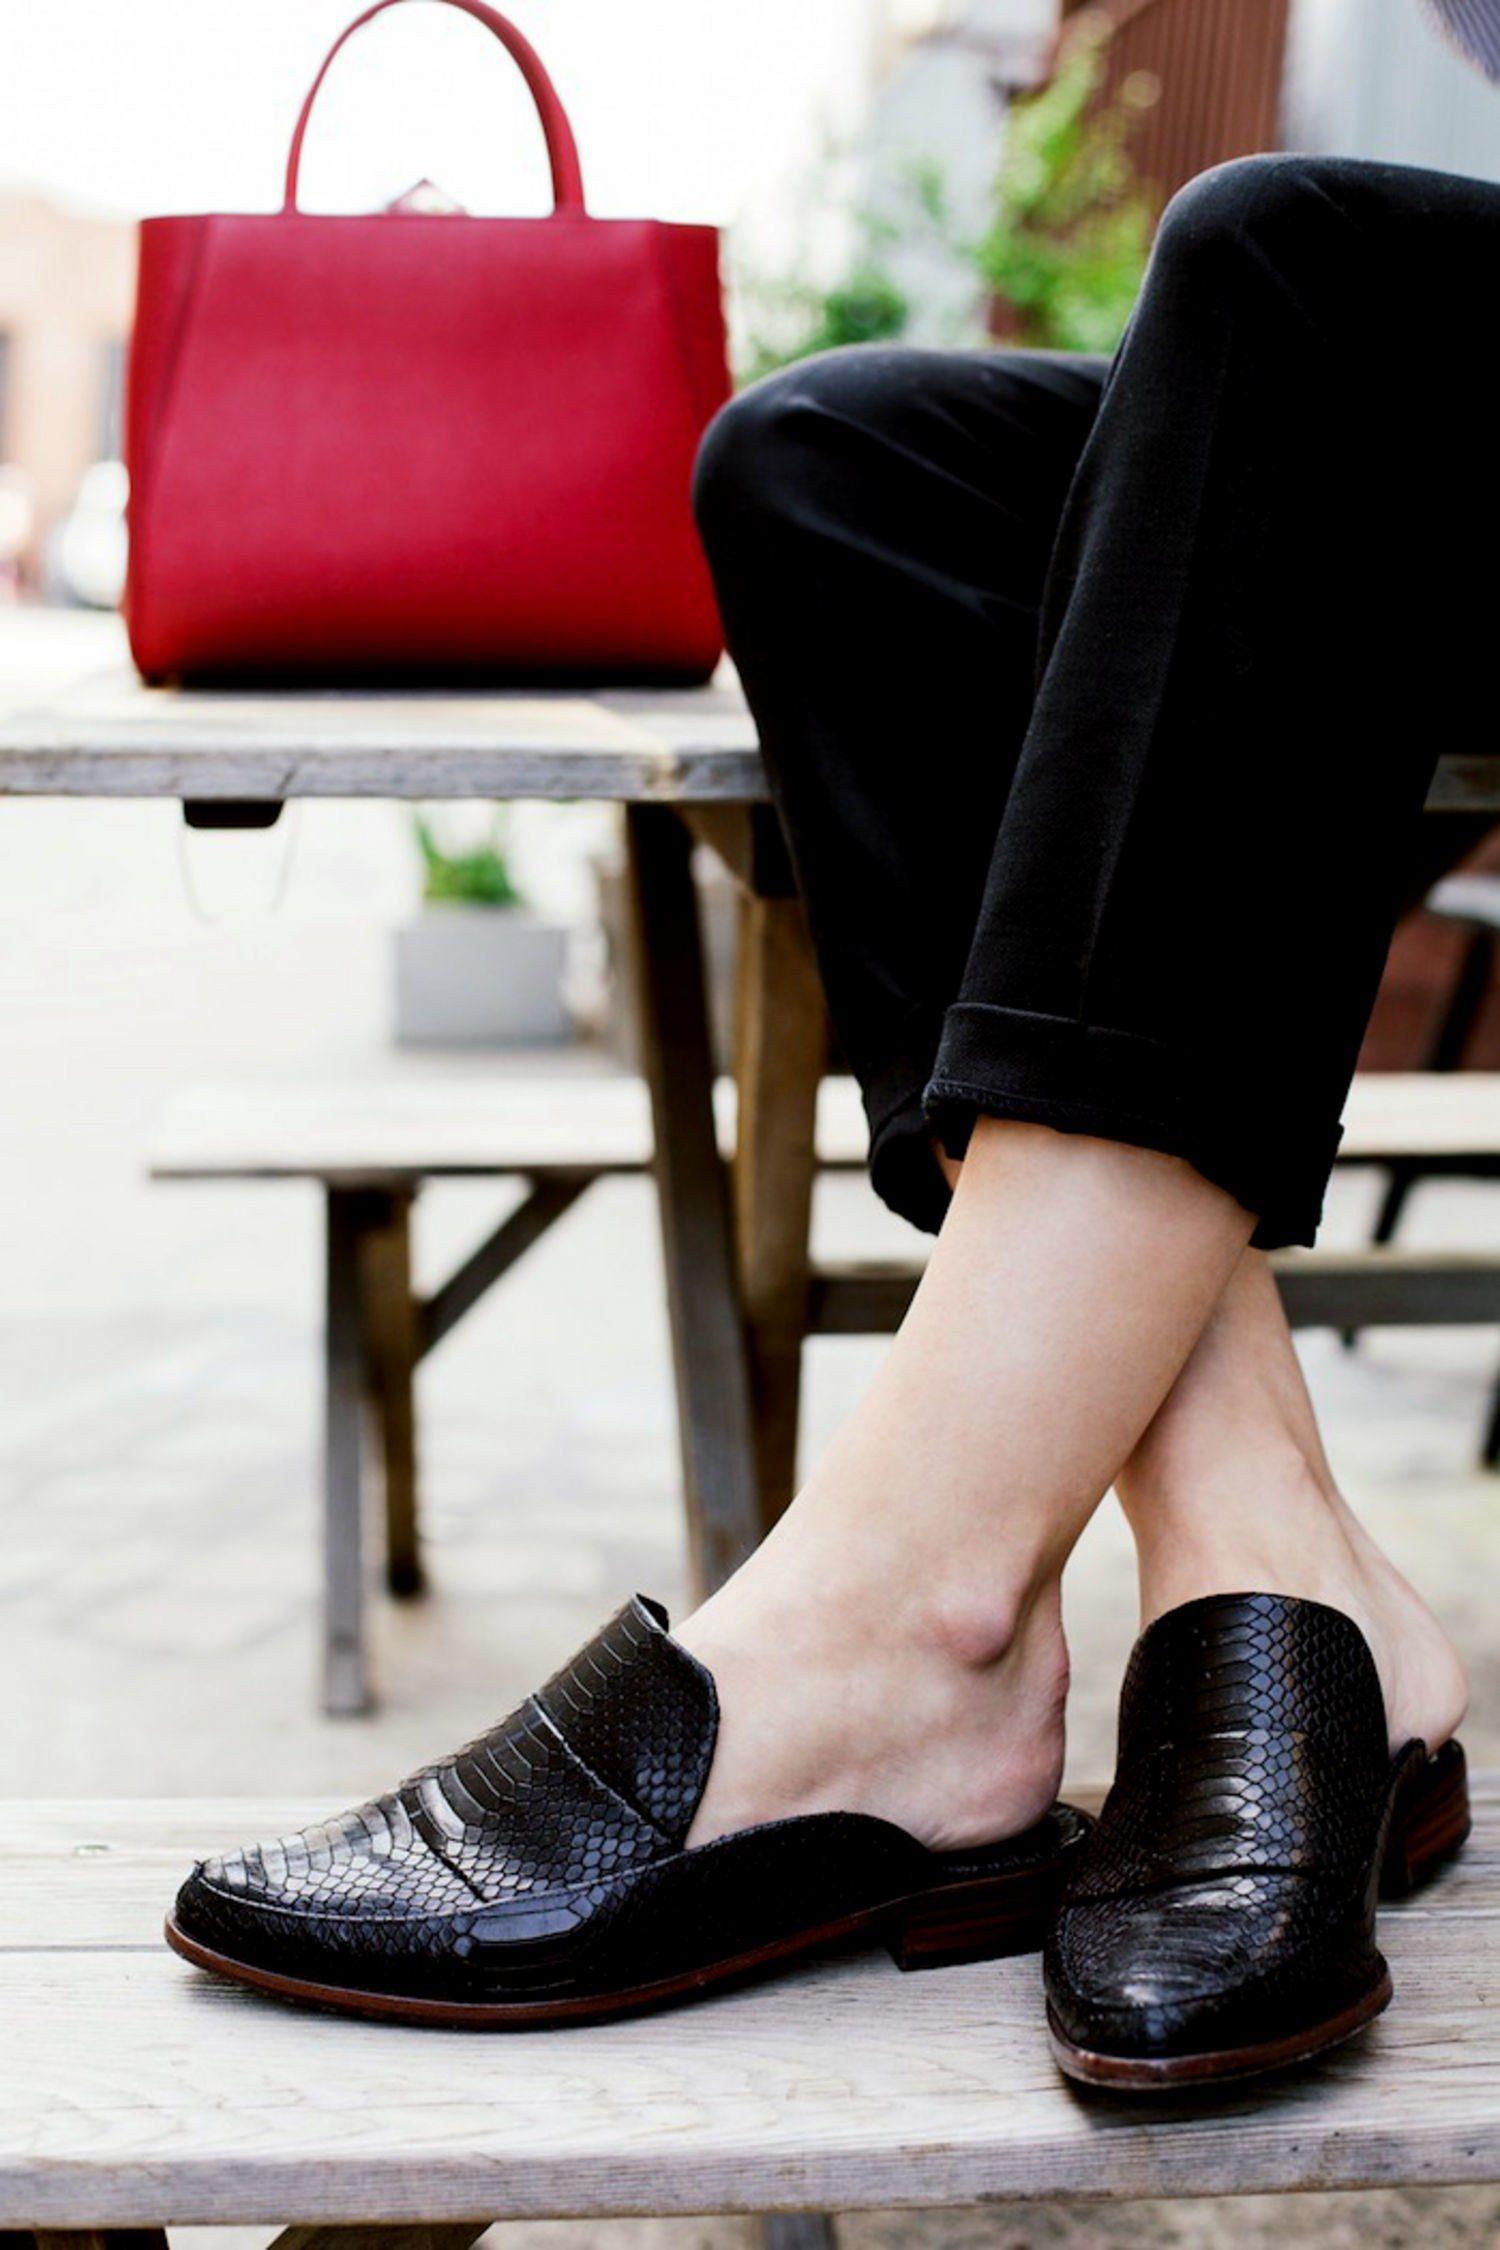 ea843ffa749 How to Wear Slipper Mules